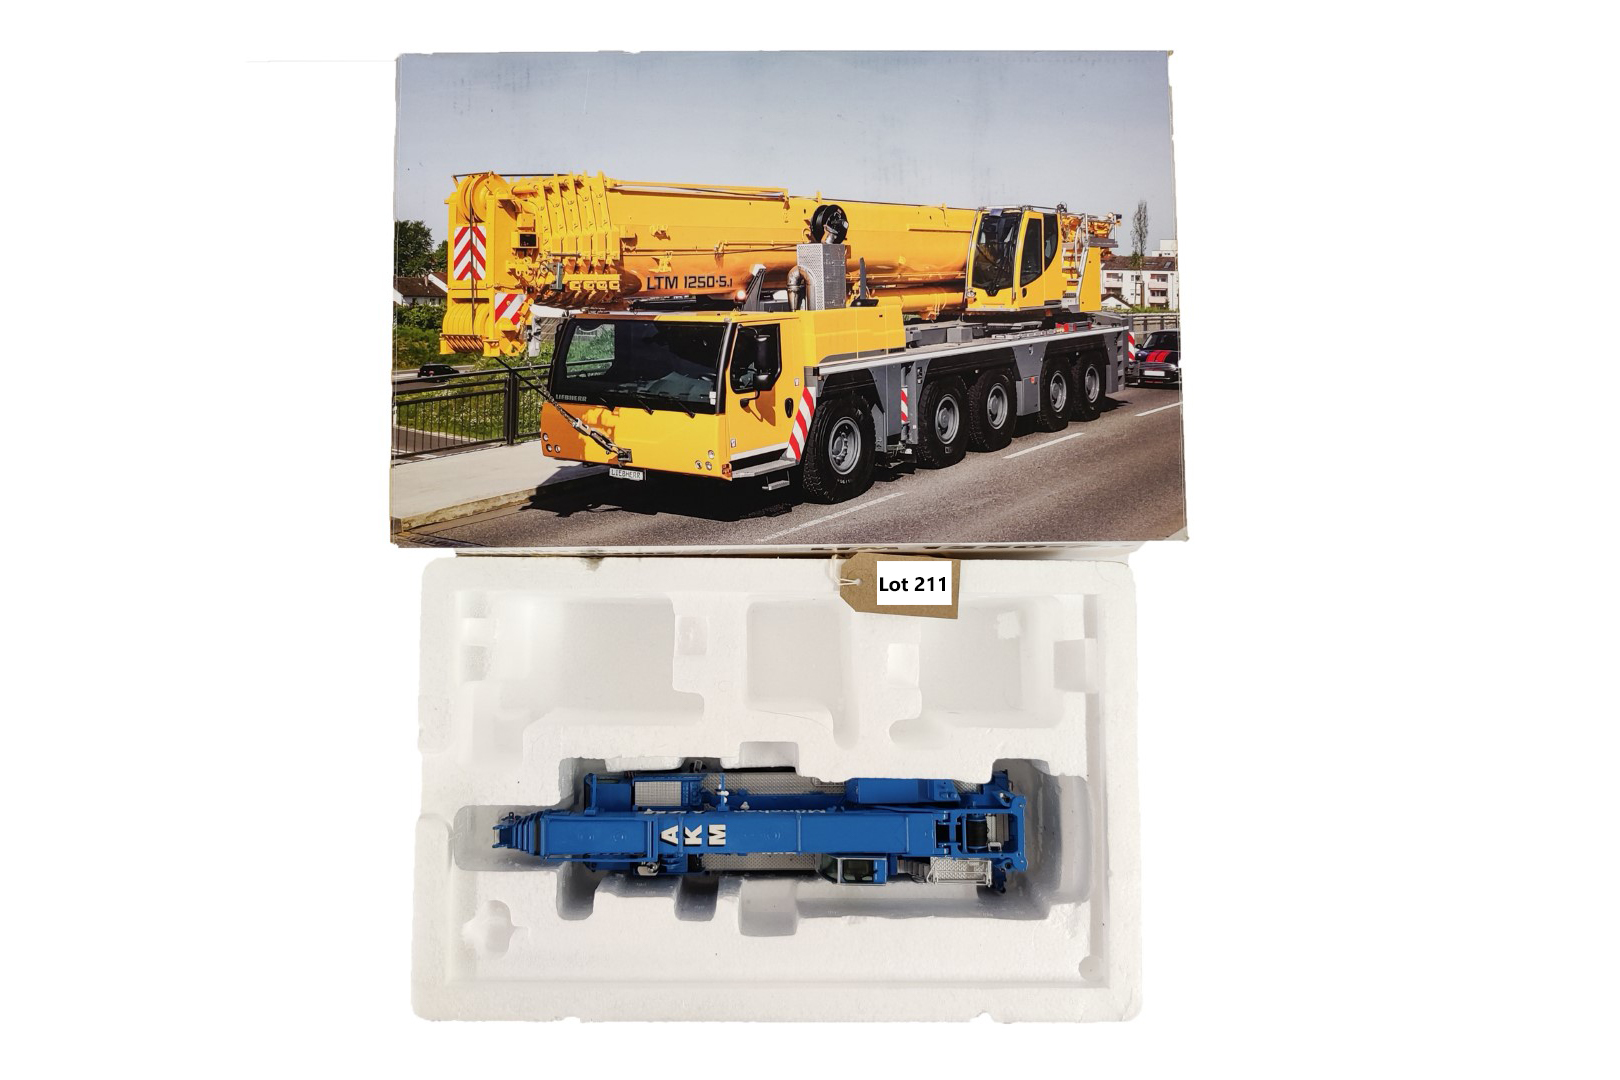 NZG Liebherr LTM1250-5.1 Mobile Crane AKM